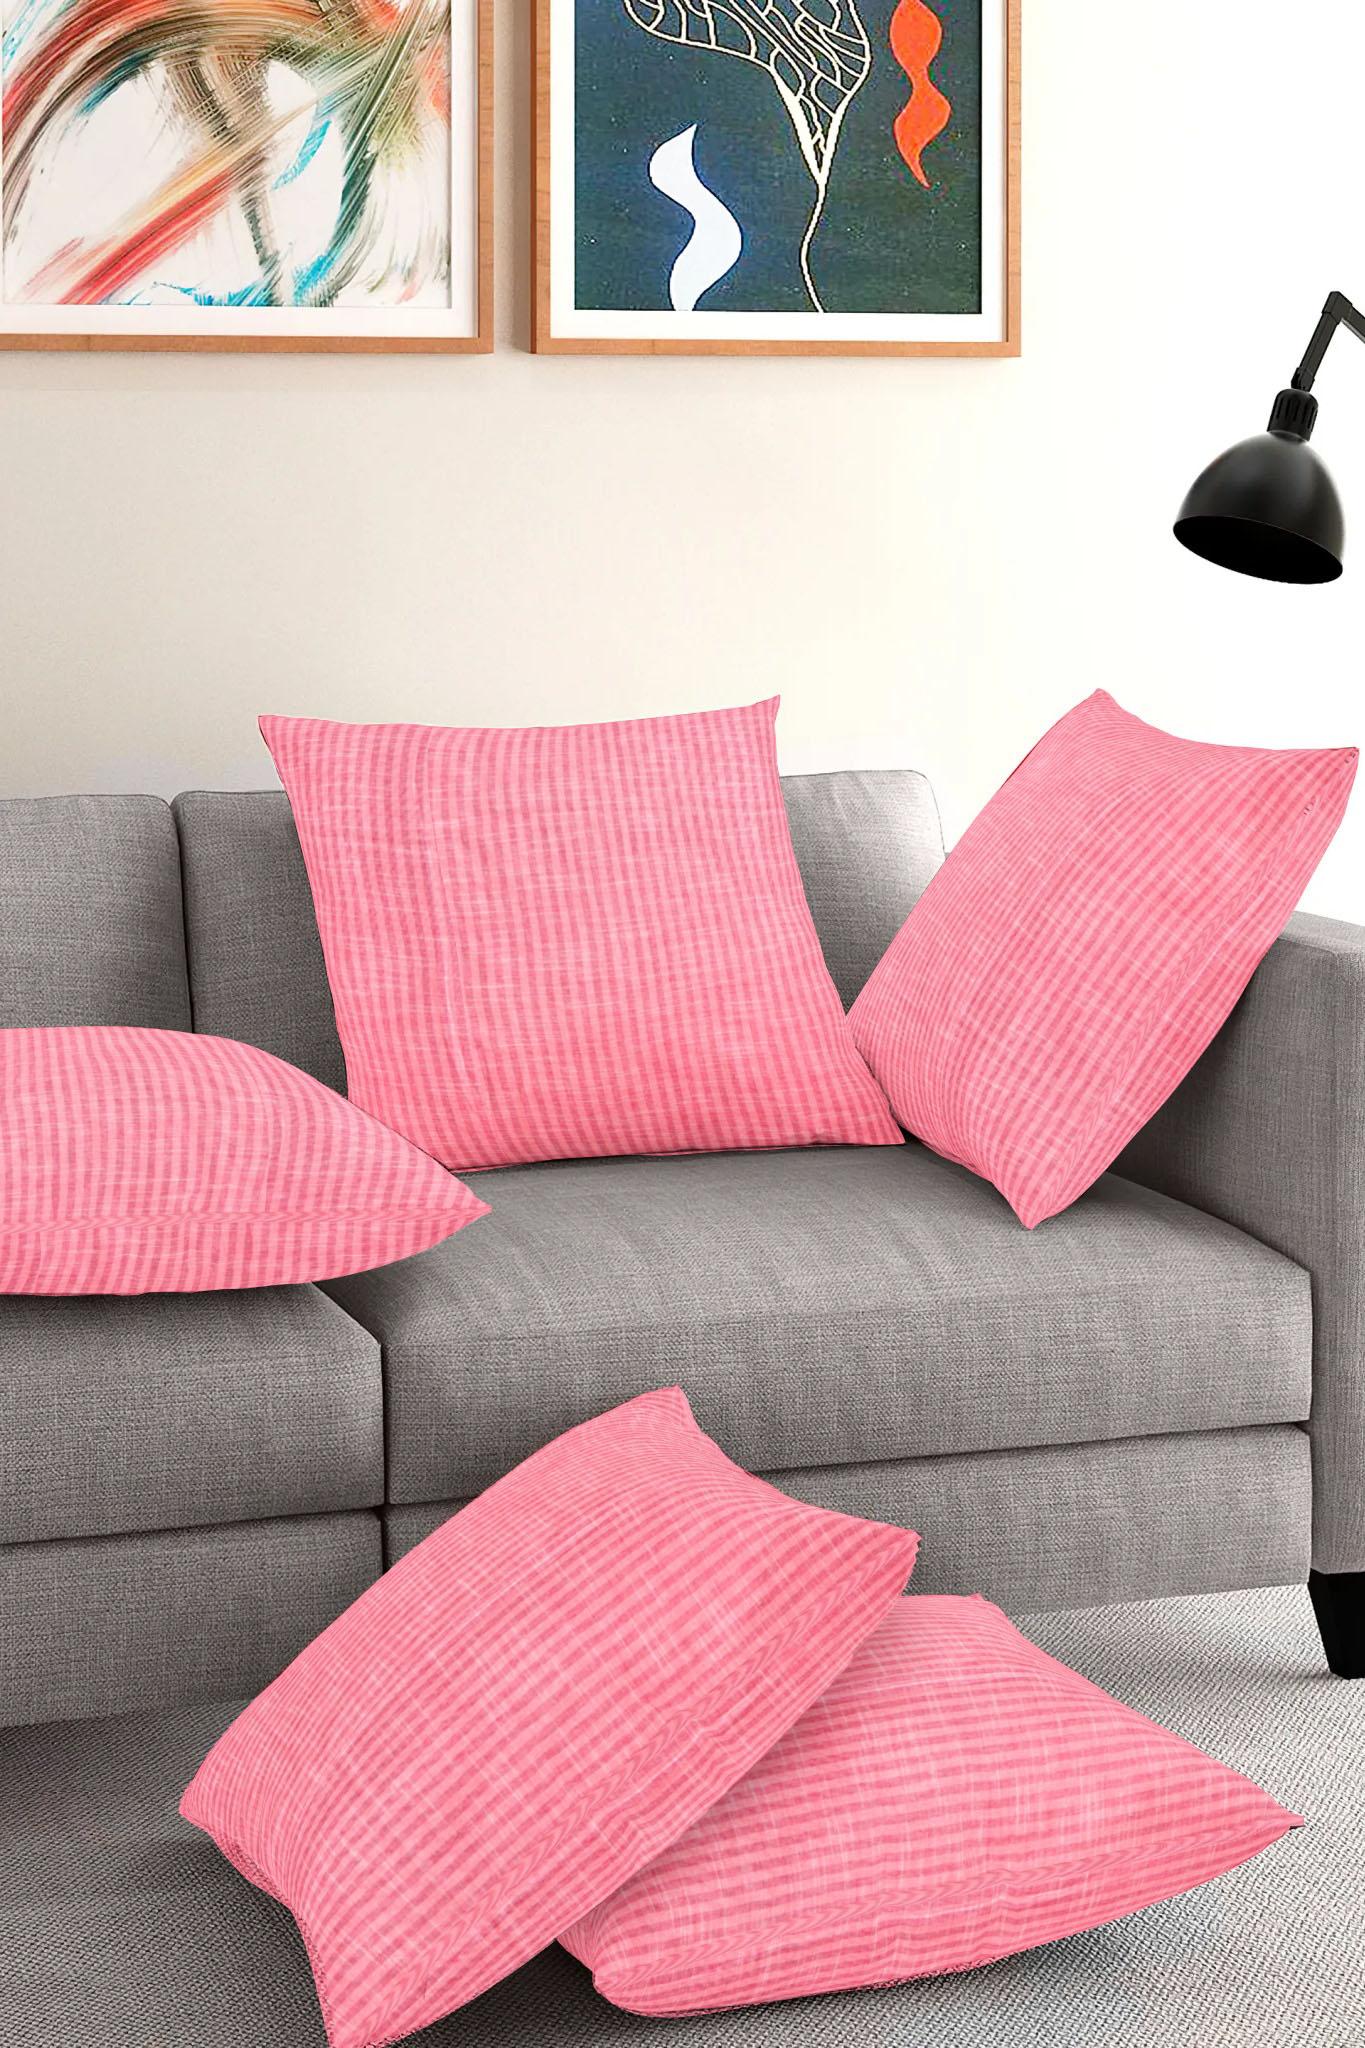 /home/customer/www/fabartcraft.com/public_html/uploadshttps://www.shopolics.com/uploads/images/medium/Pink-White-Cotton-Cushion-Cover-35399.jpg